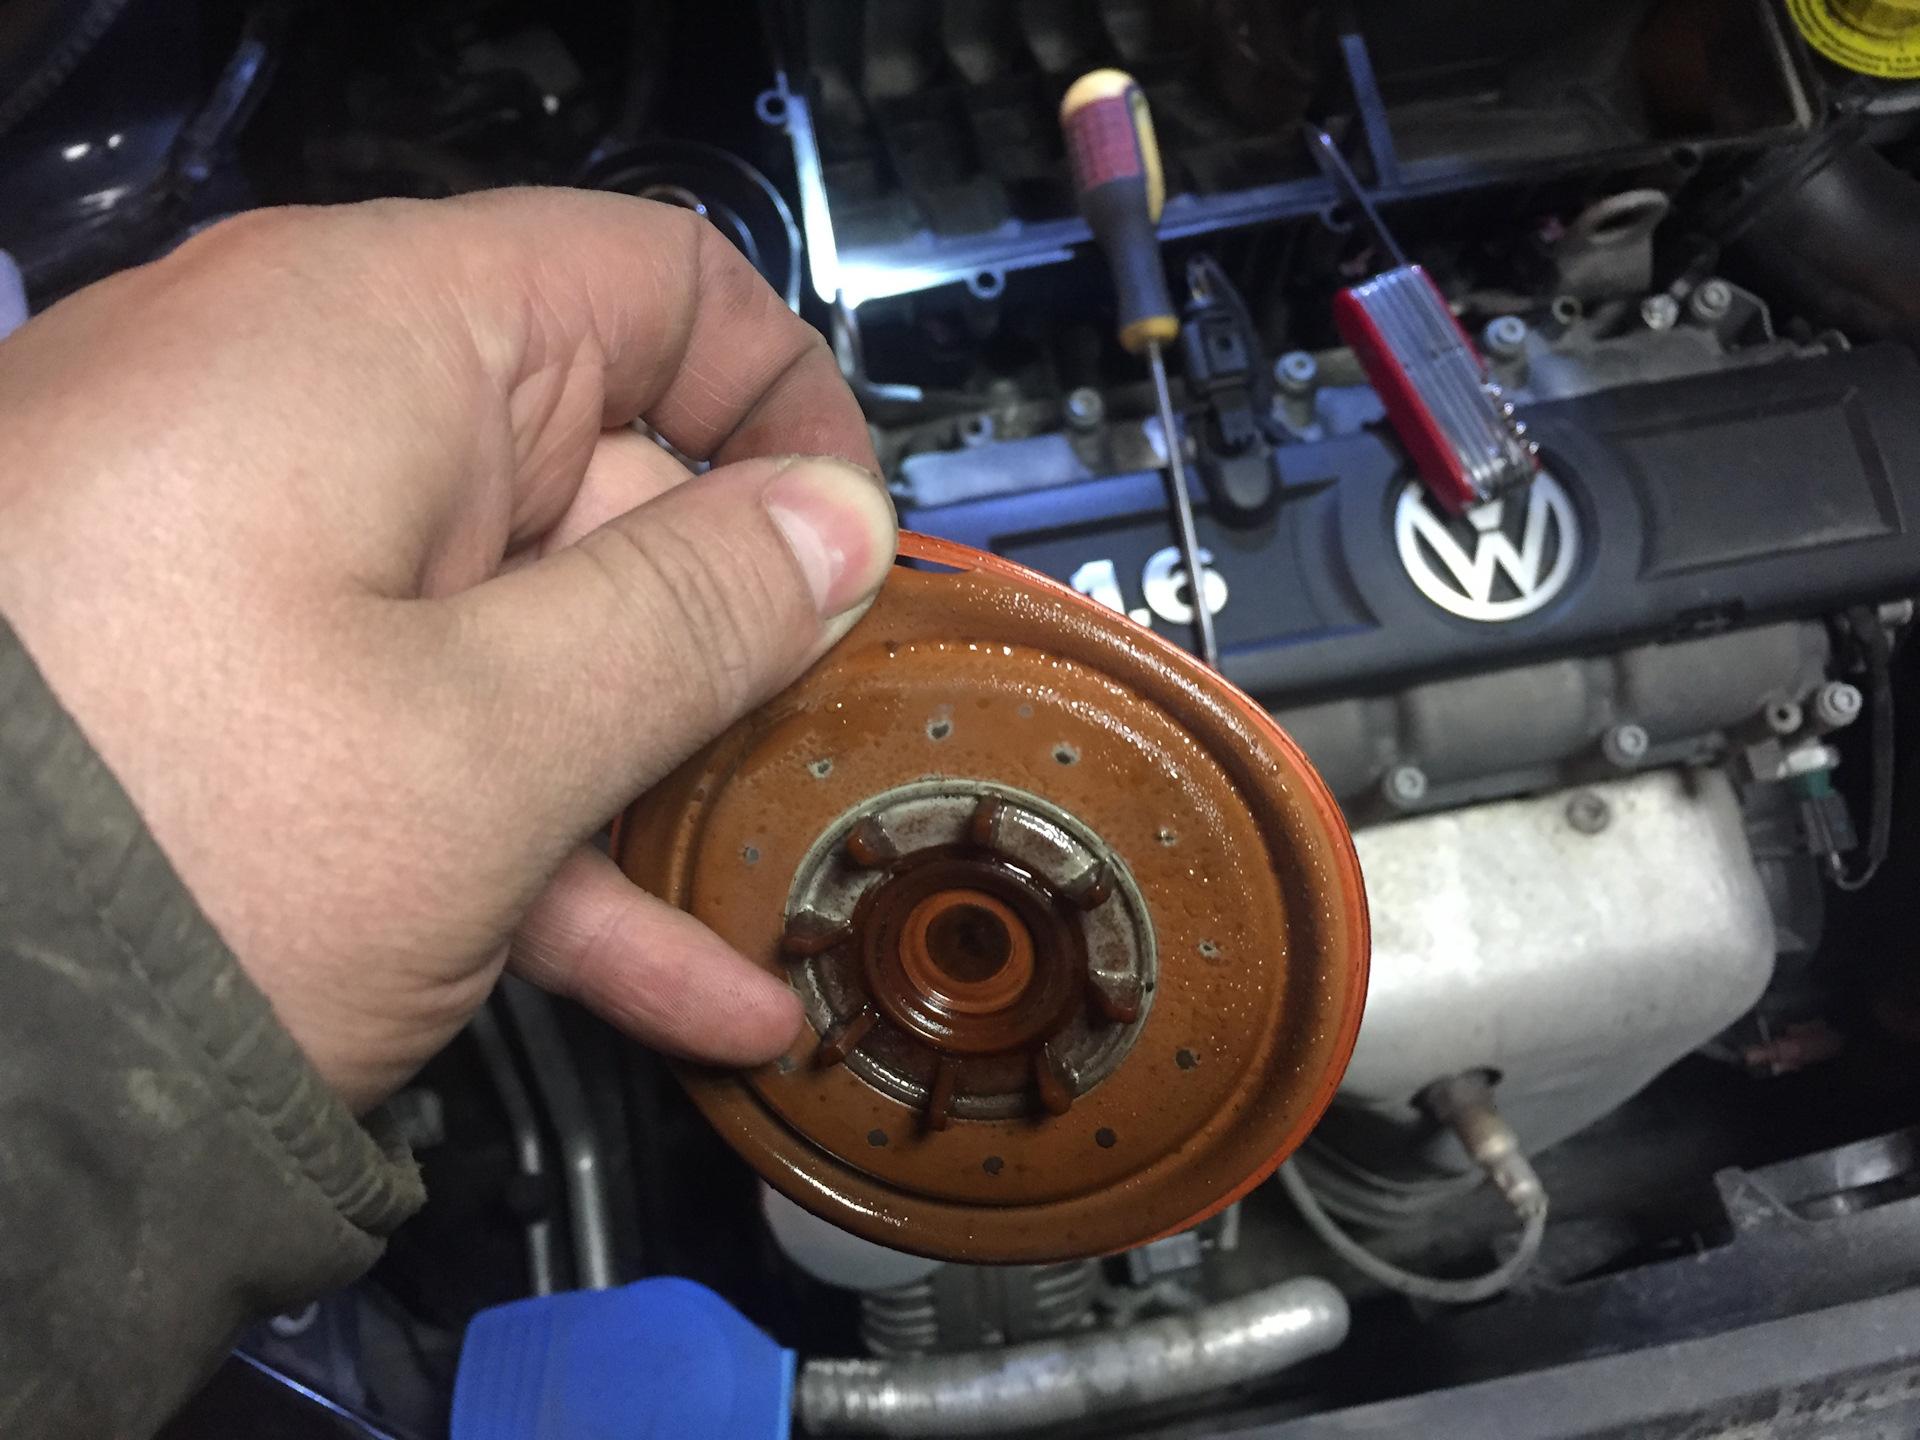 замена мембраны клапана volkswagen polo 6r